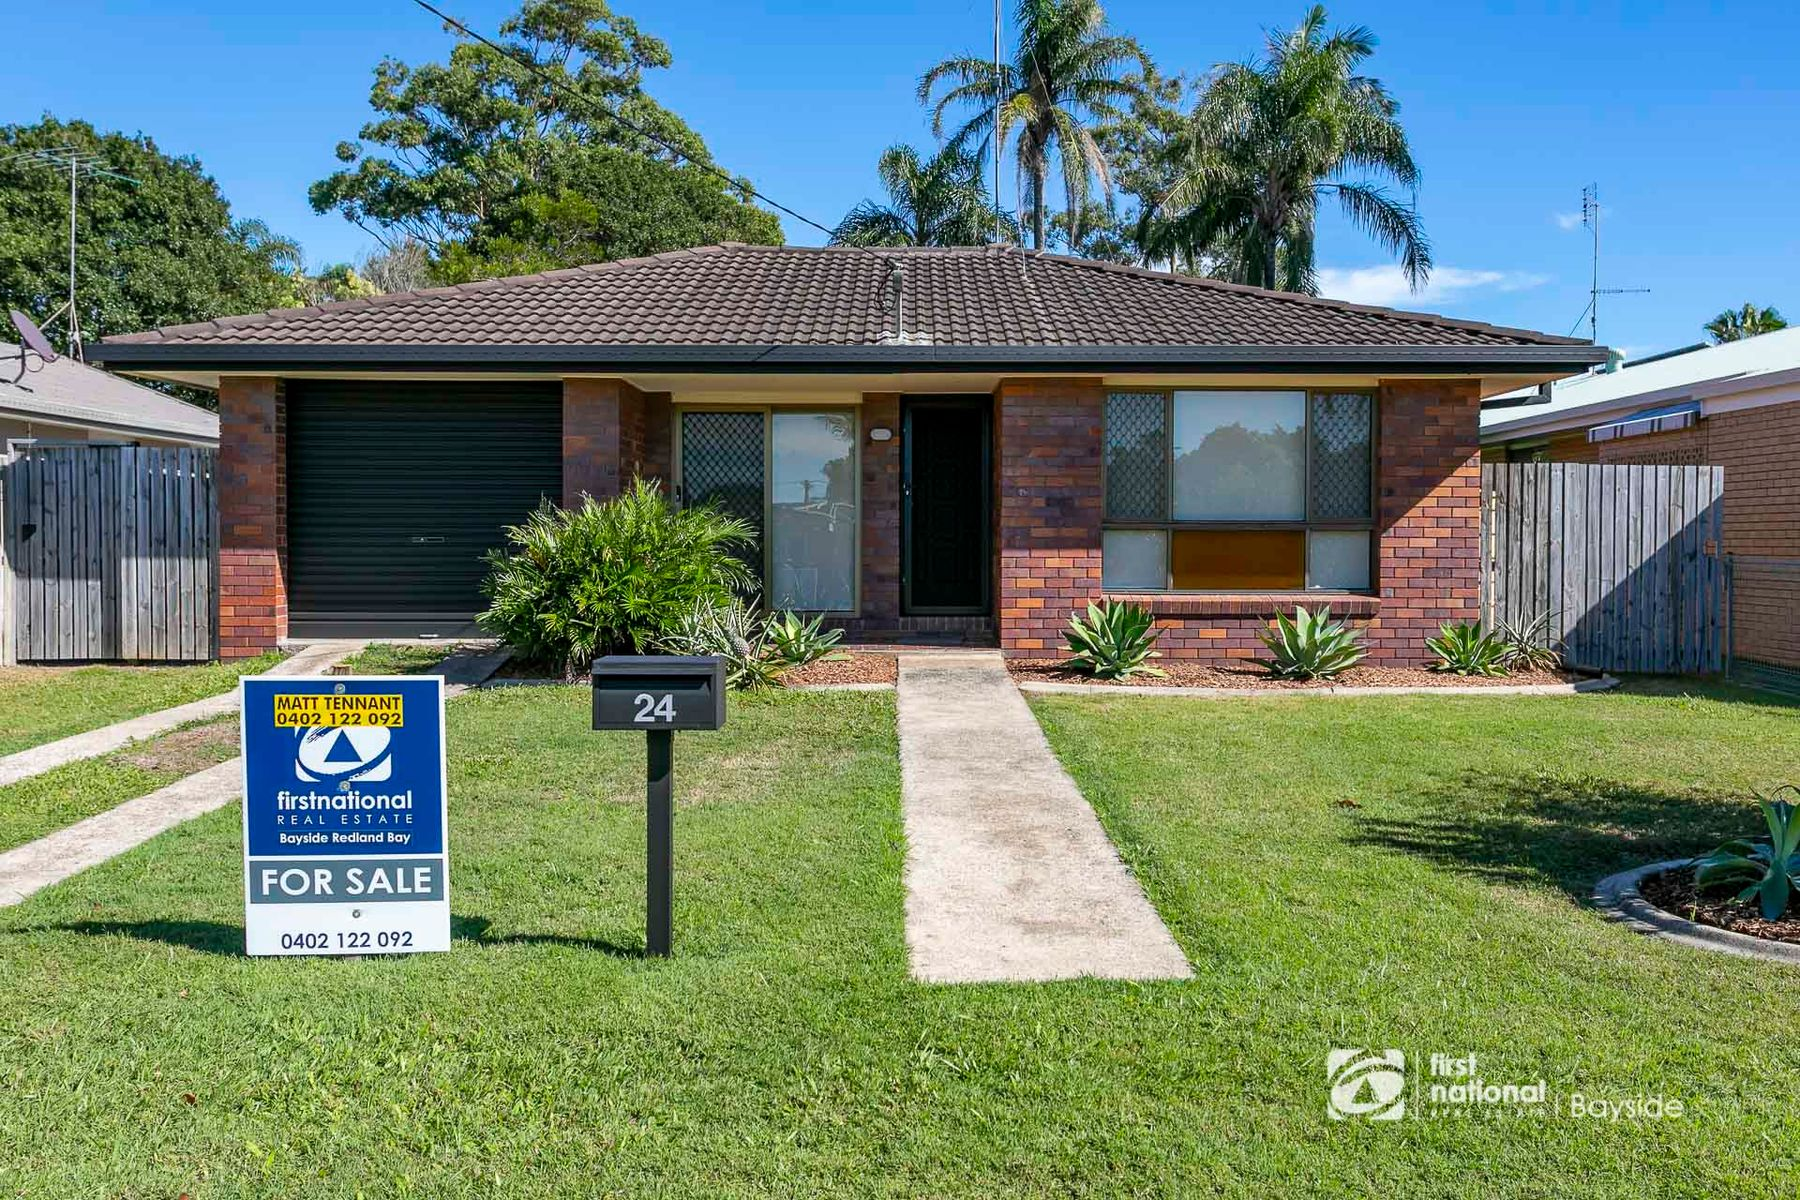 24 Lisa Street, Redland Bay, QLD 4165